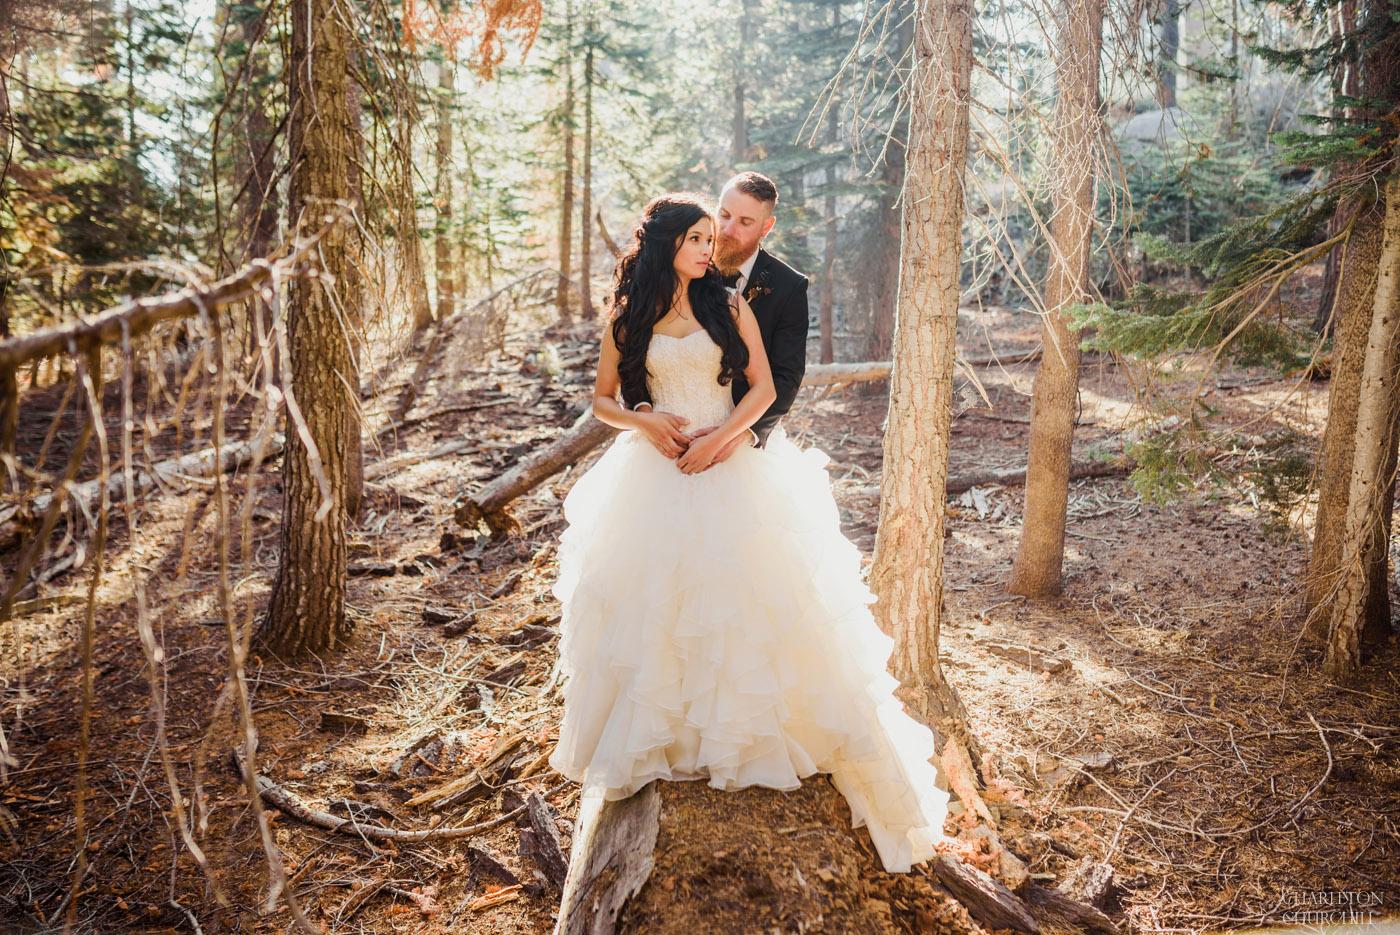 creative forest wedding photos